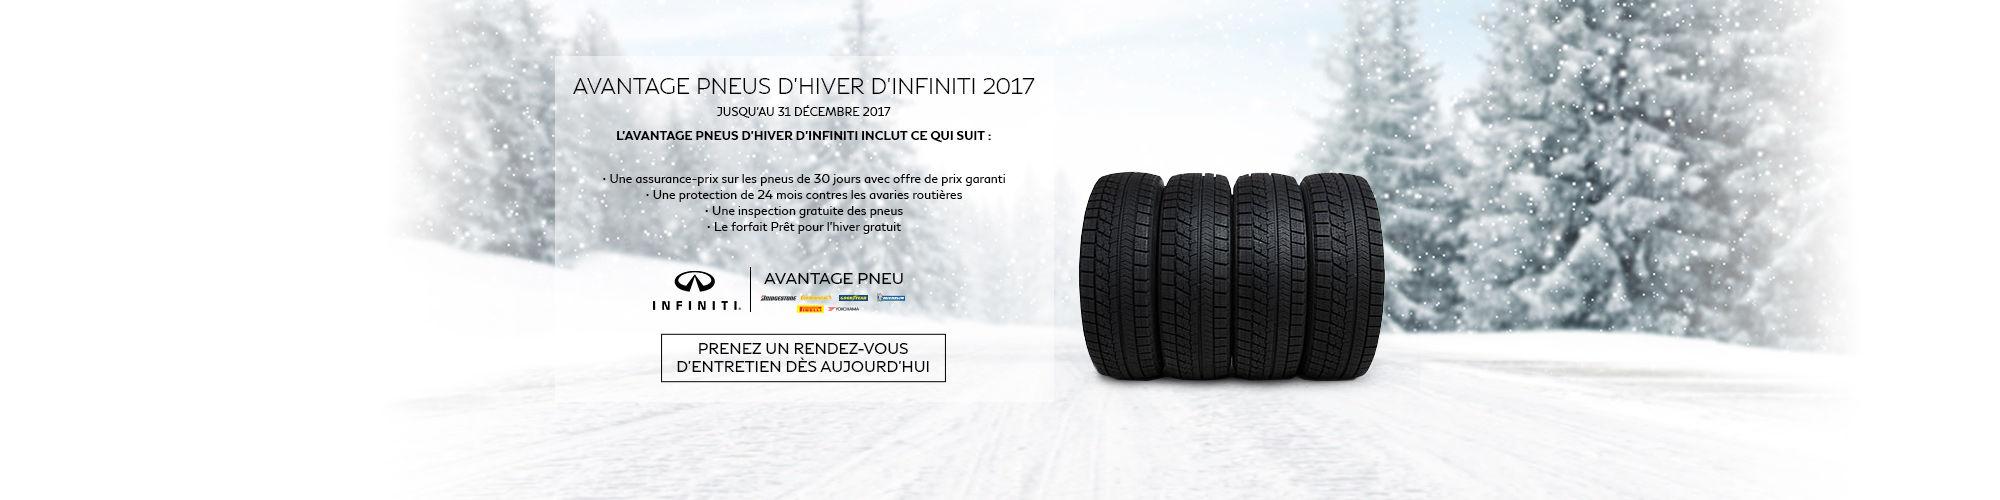 Avantage pneus d'hiver Infiniti